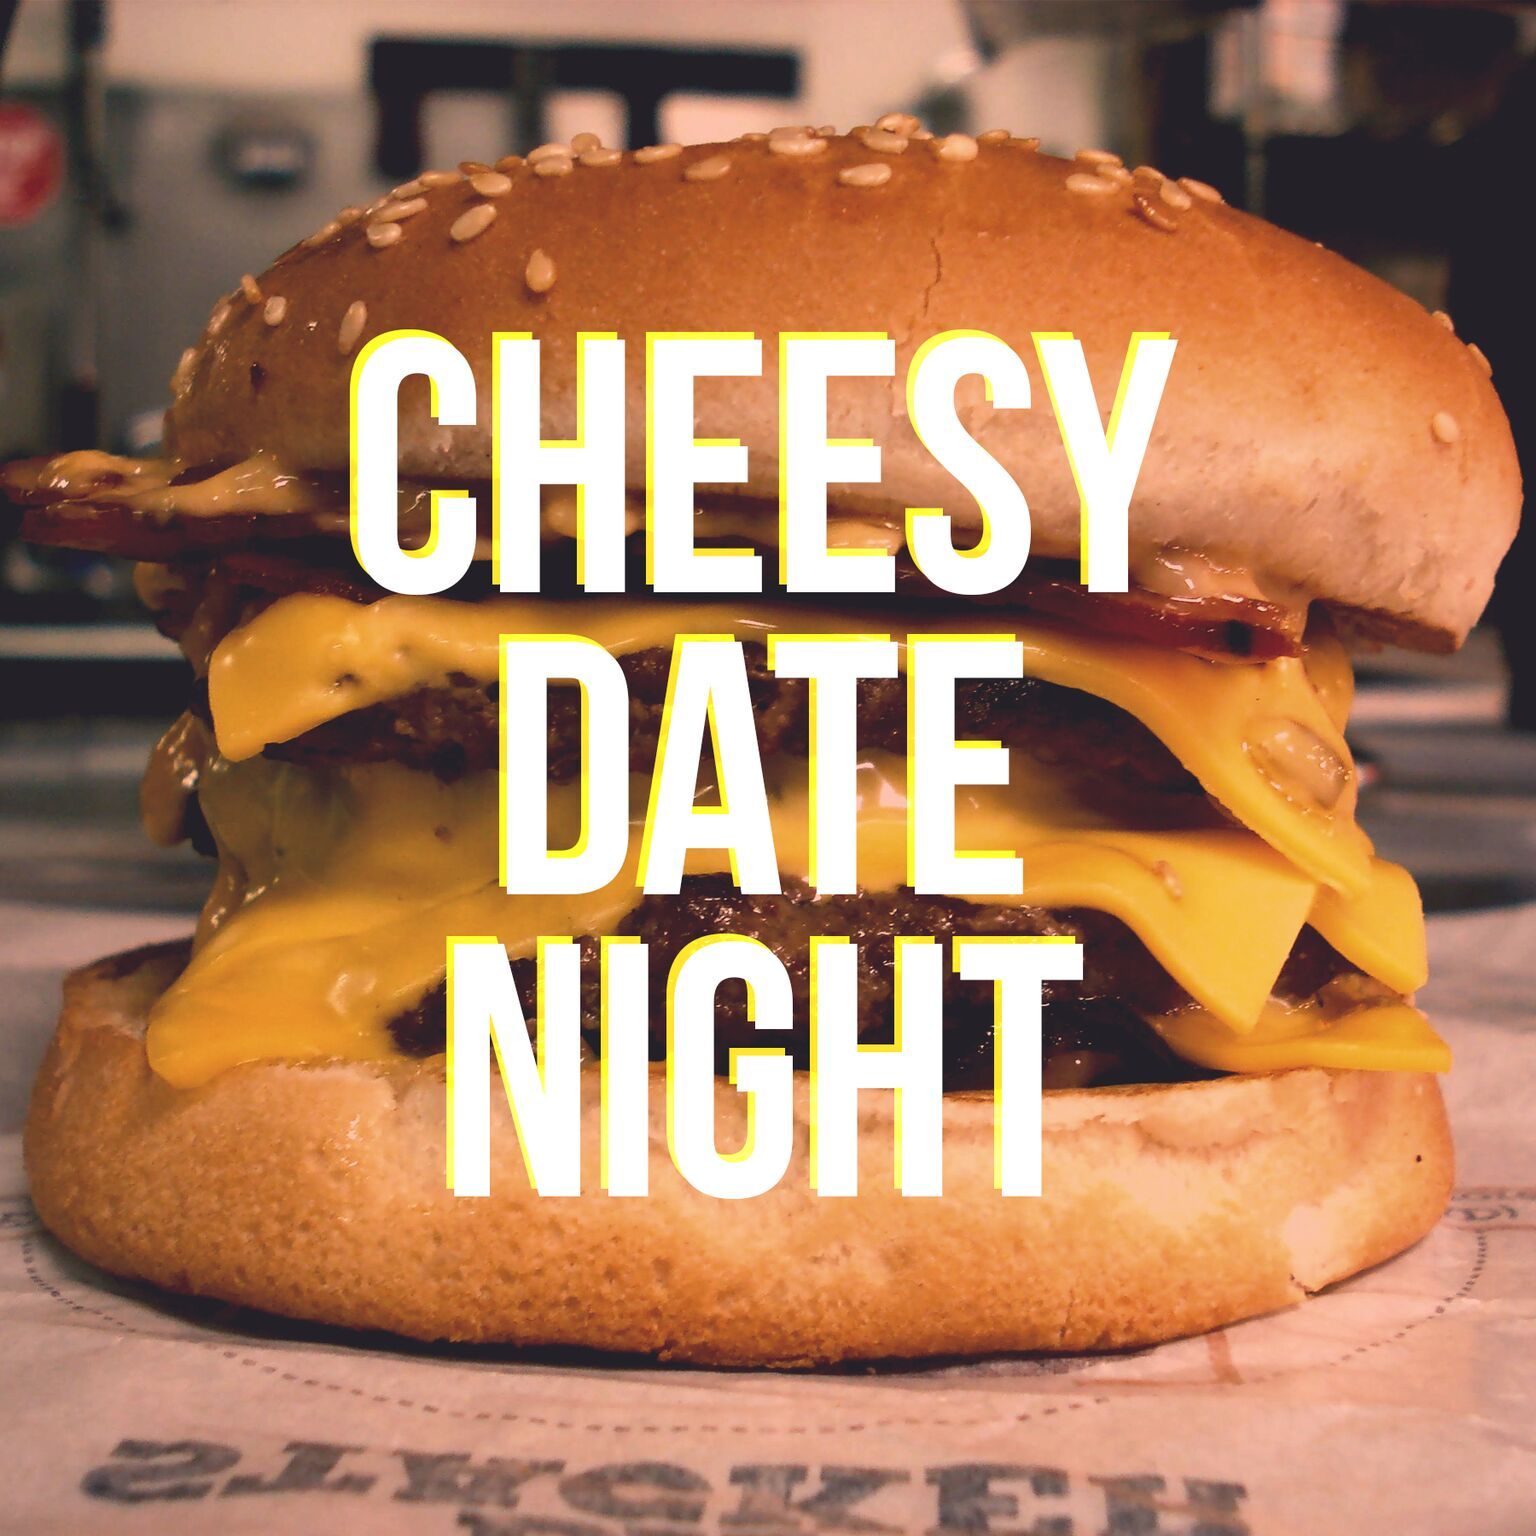 Cheesy date night